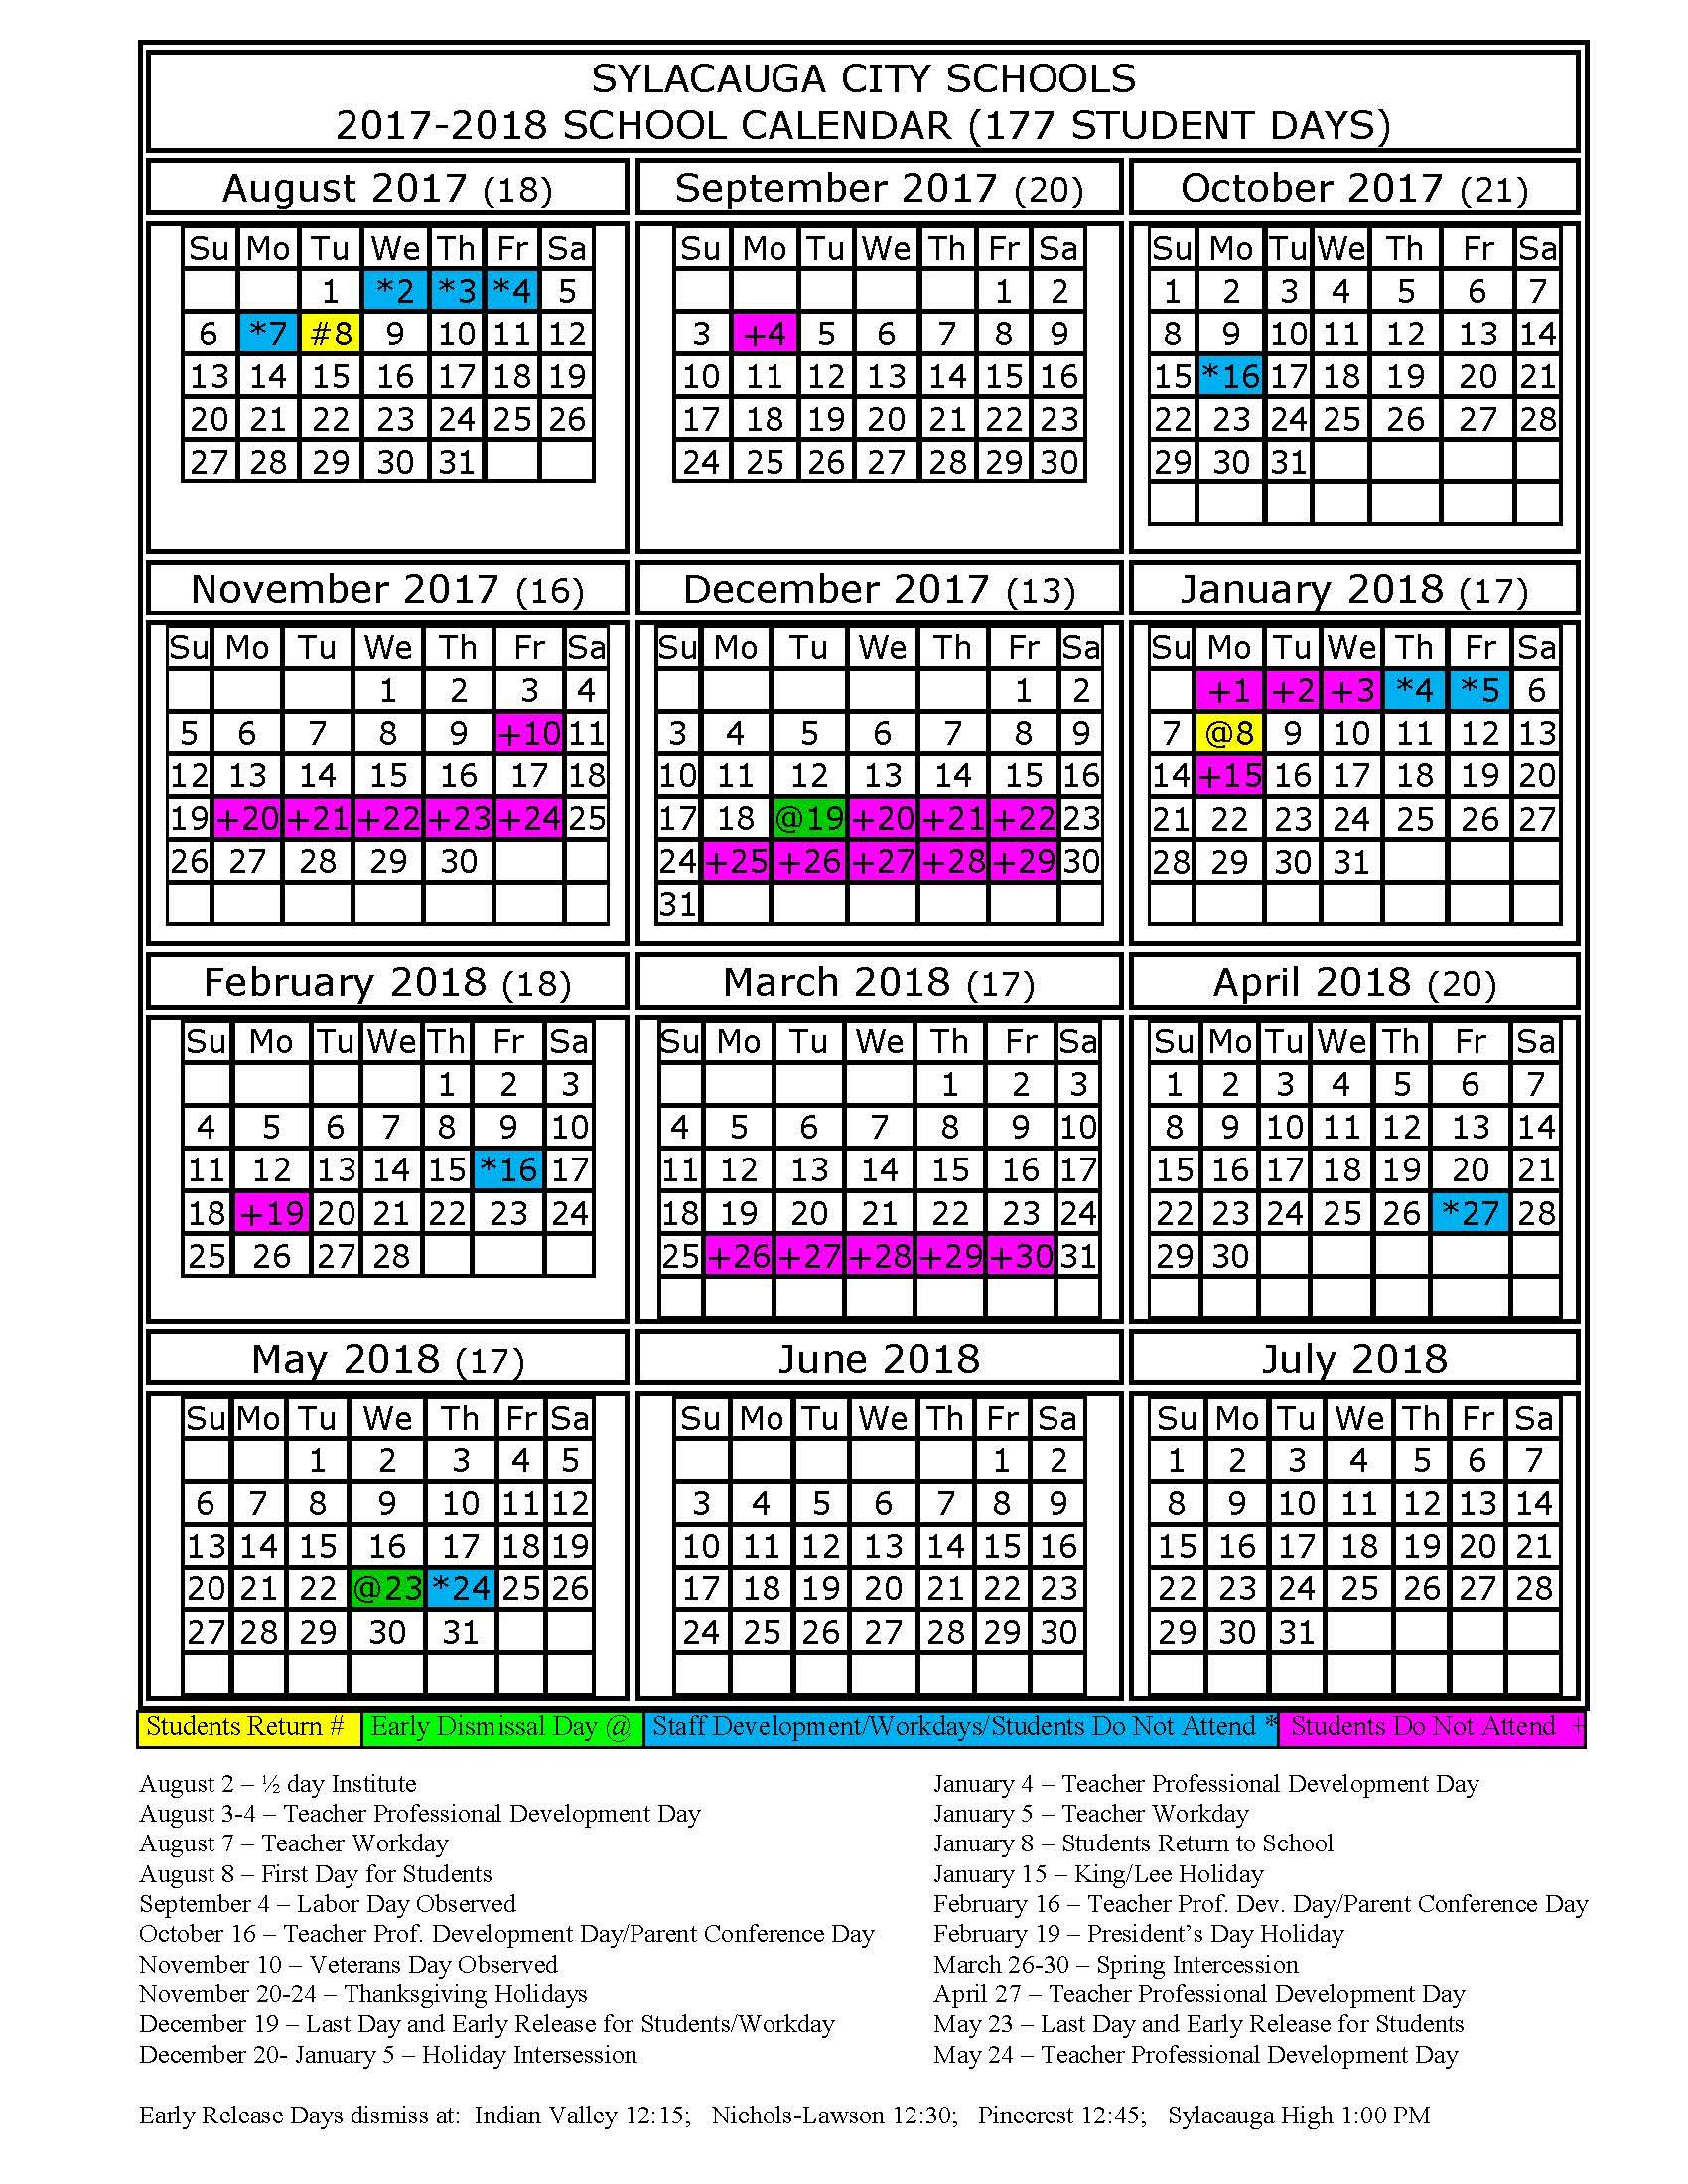 school calendars 2017 2018 as free printable pdf templates